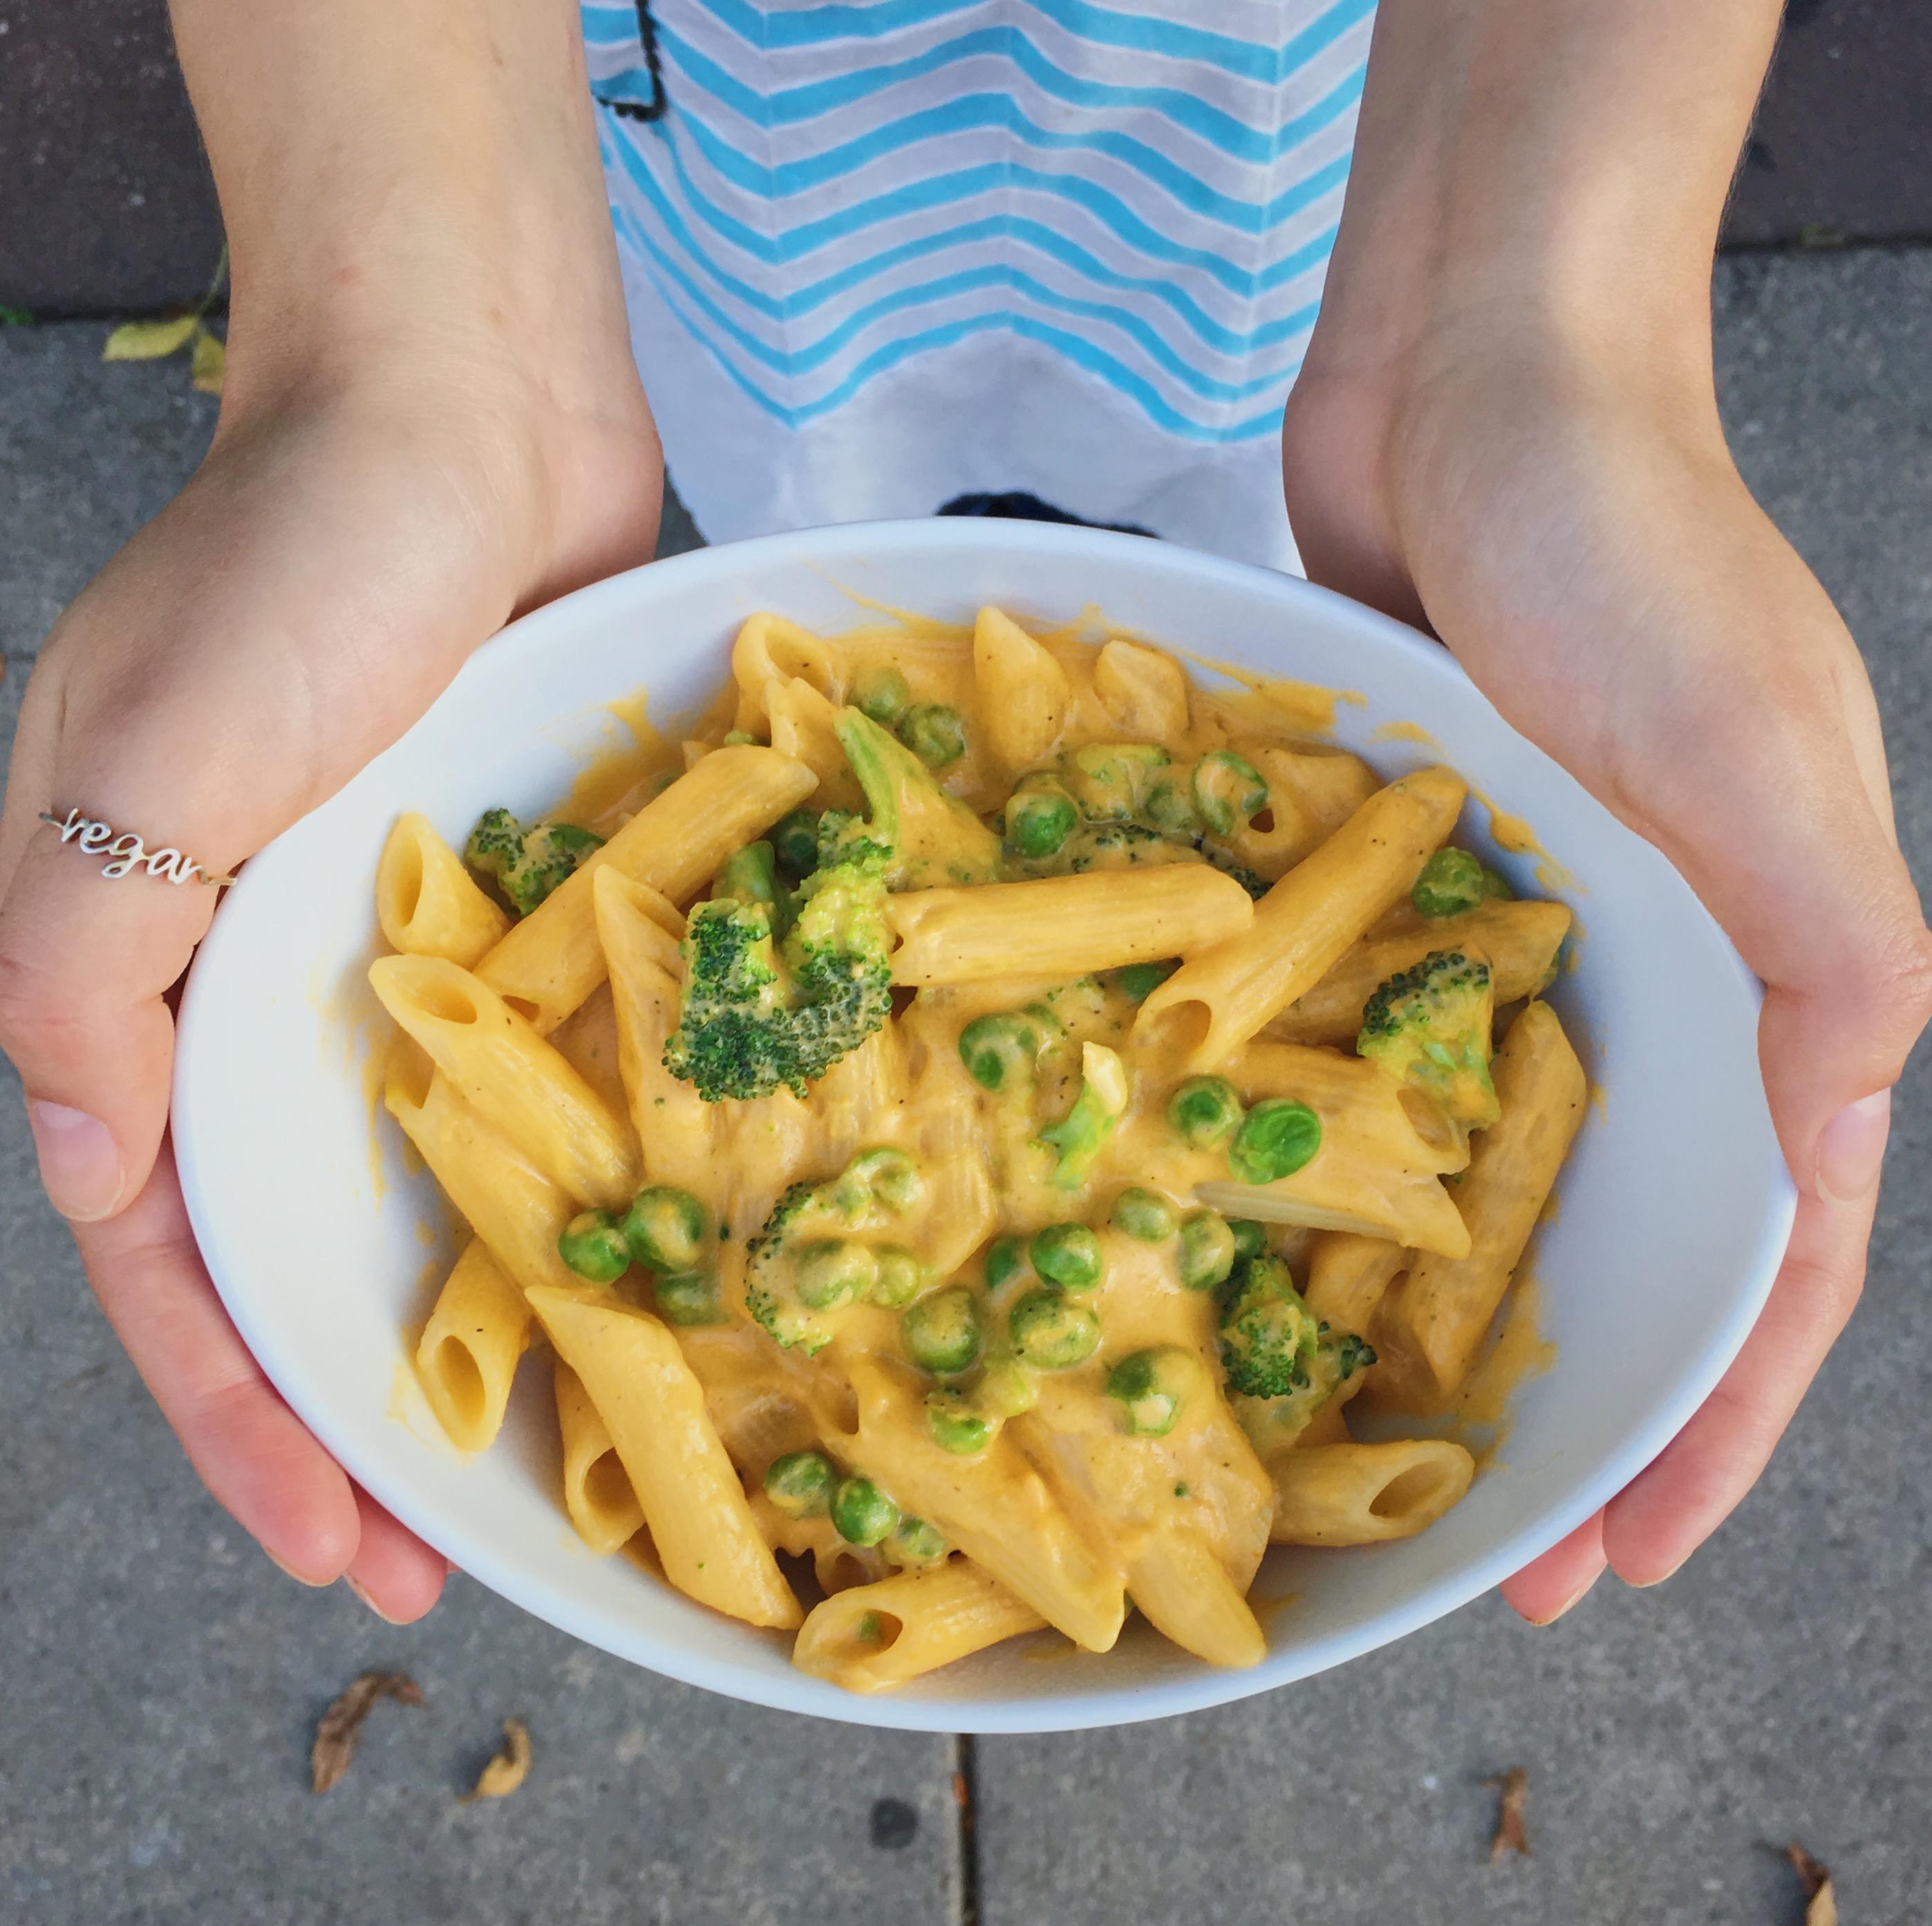 Alyssa Deem reviews Wicked Willow, a vegan restaurant in downtown Stevens Point.